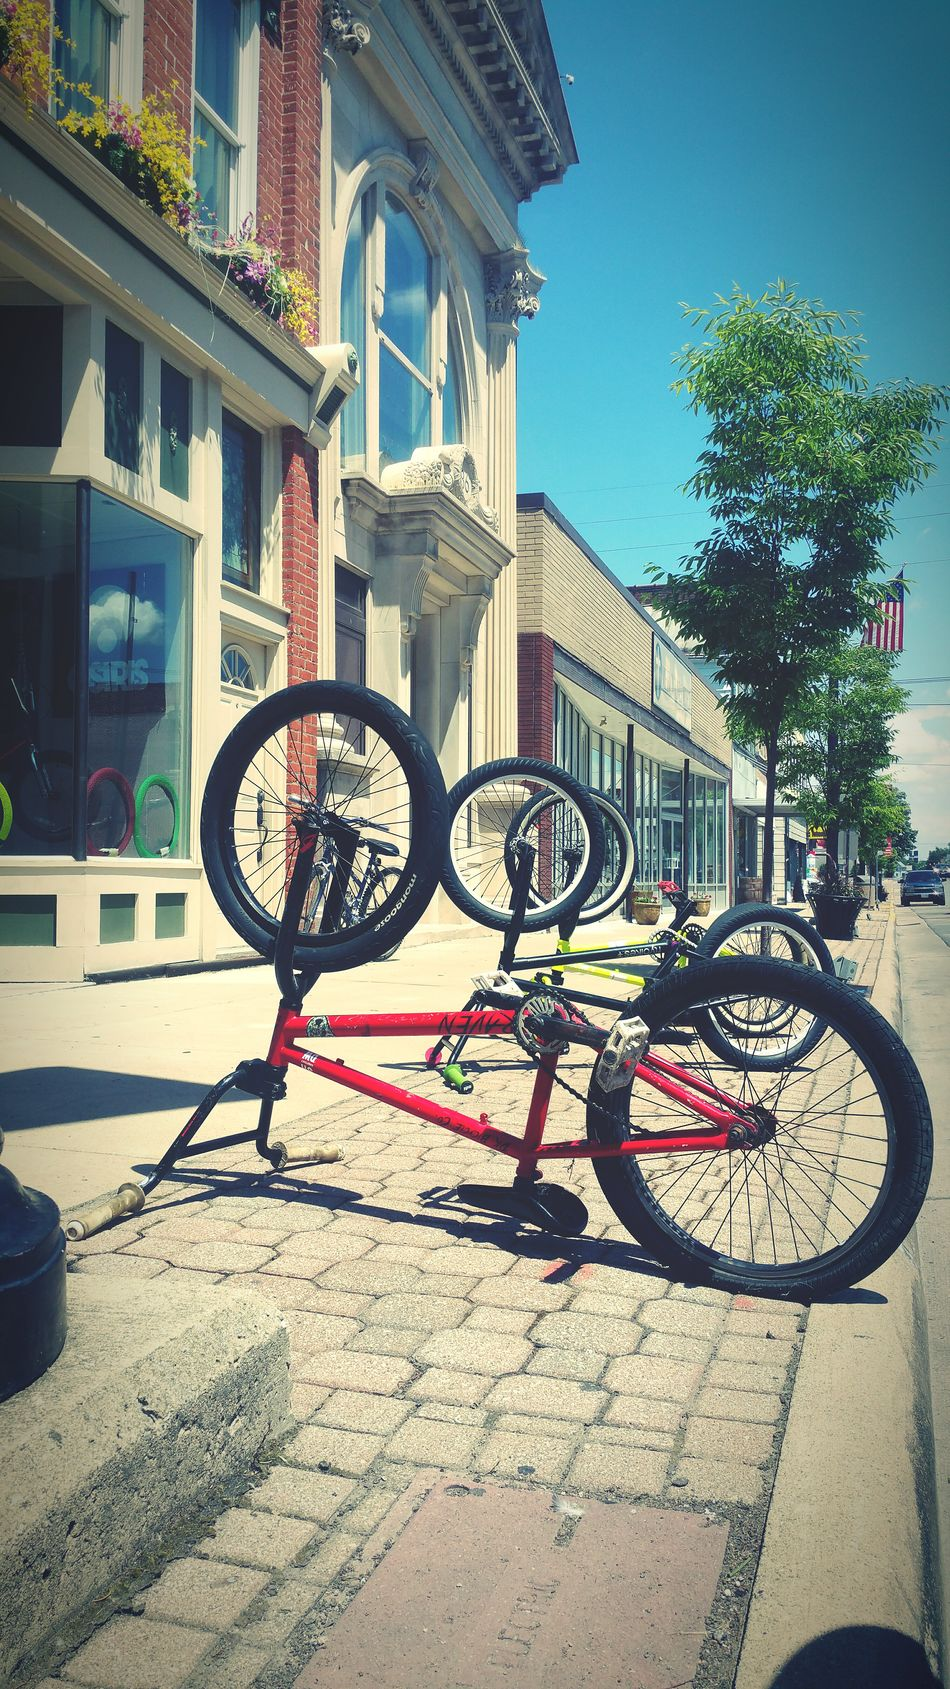 Parking at our local skate shop Bikes Skate Shop Downtown Sidewalk View